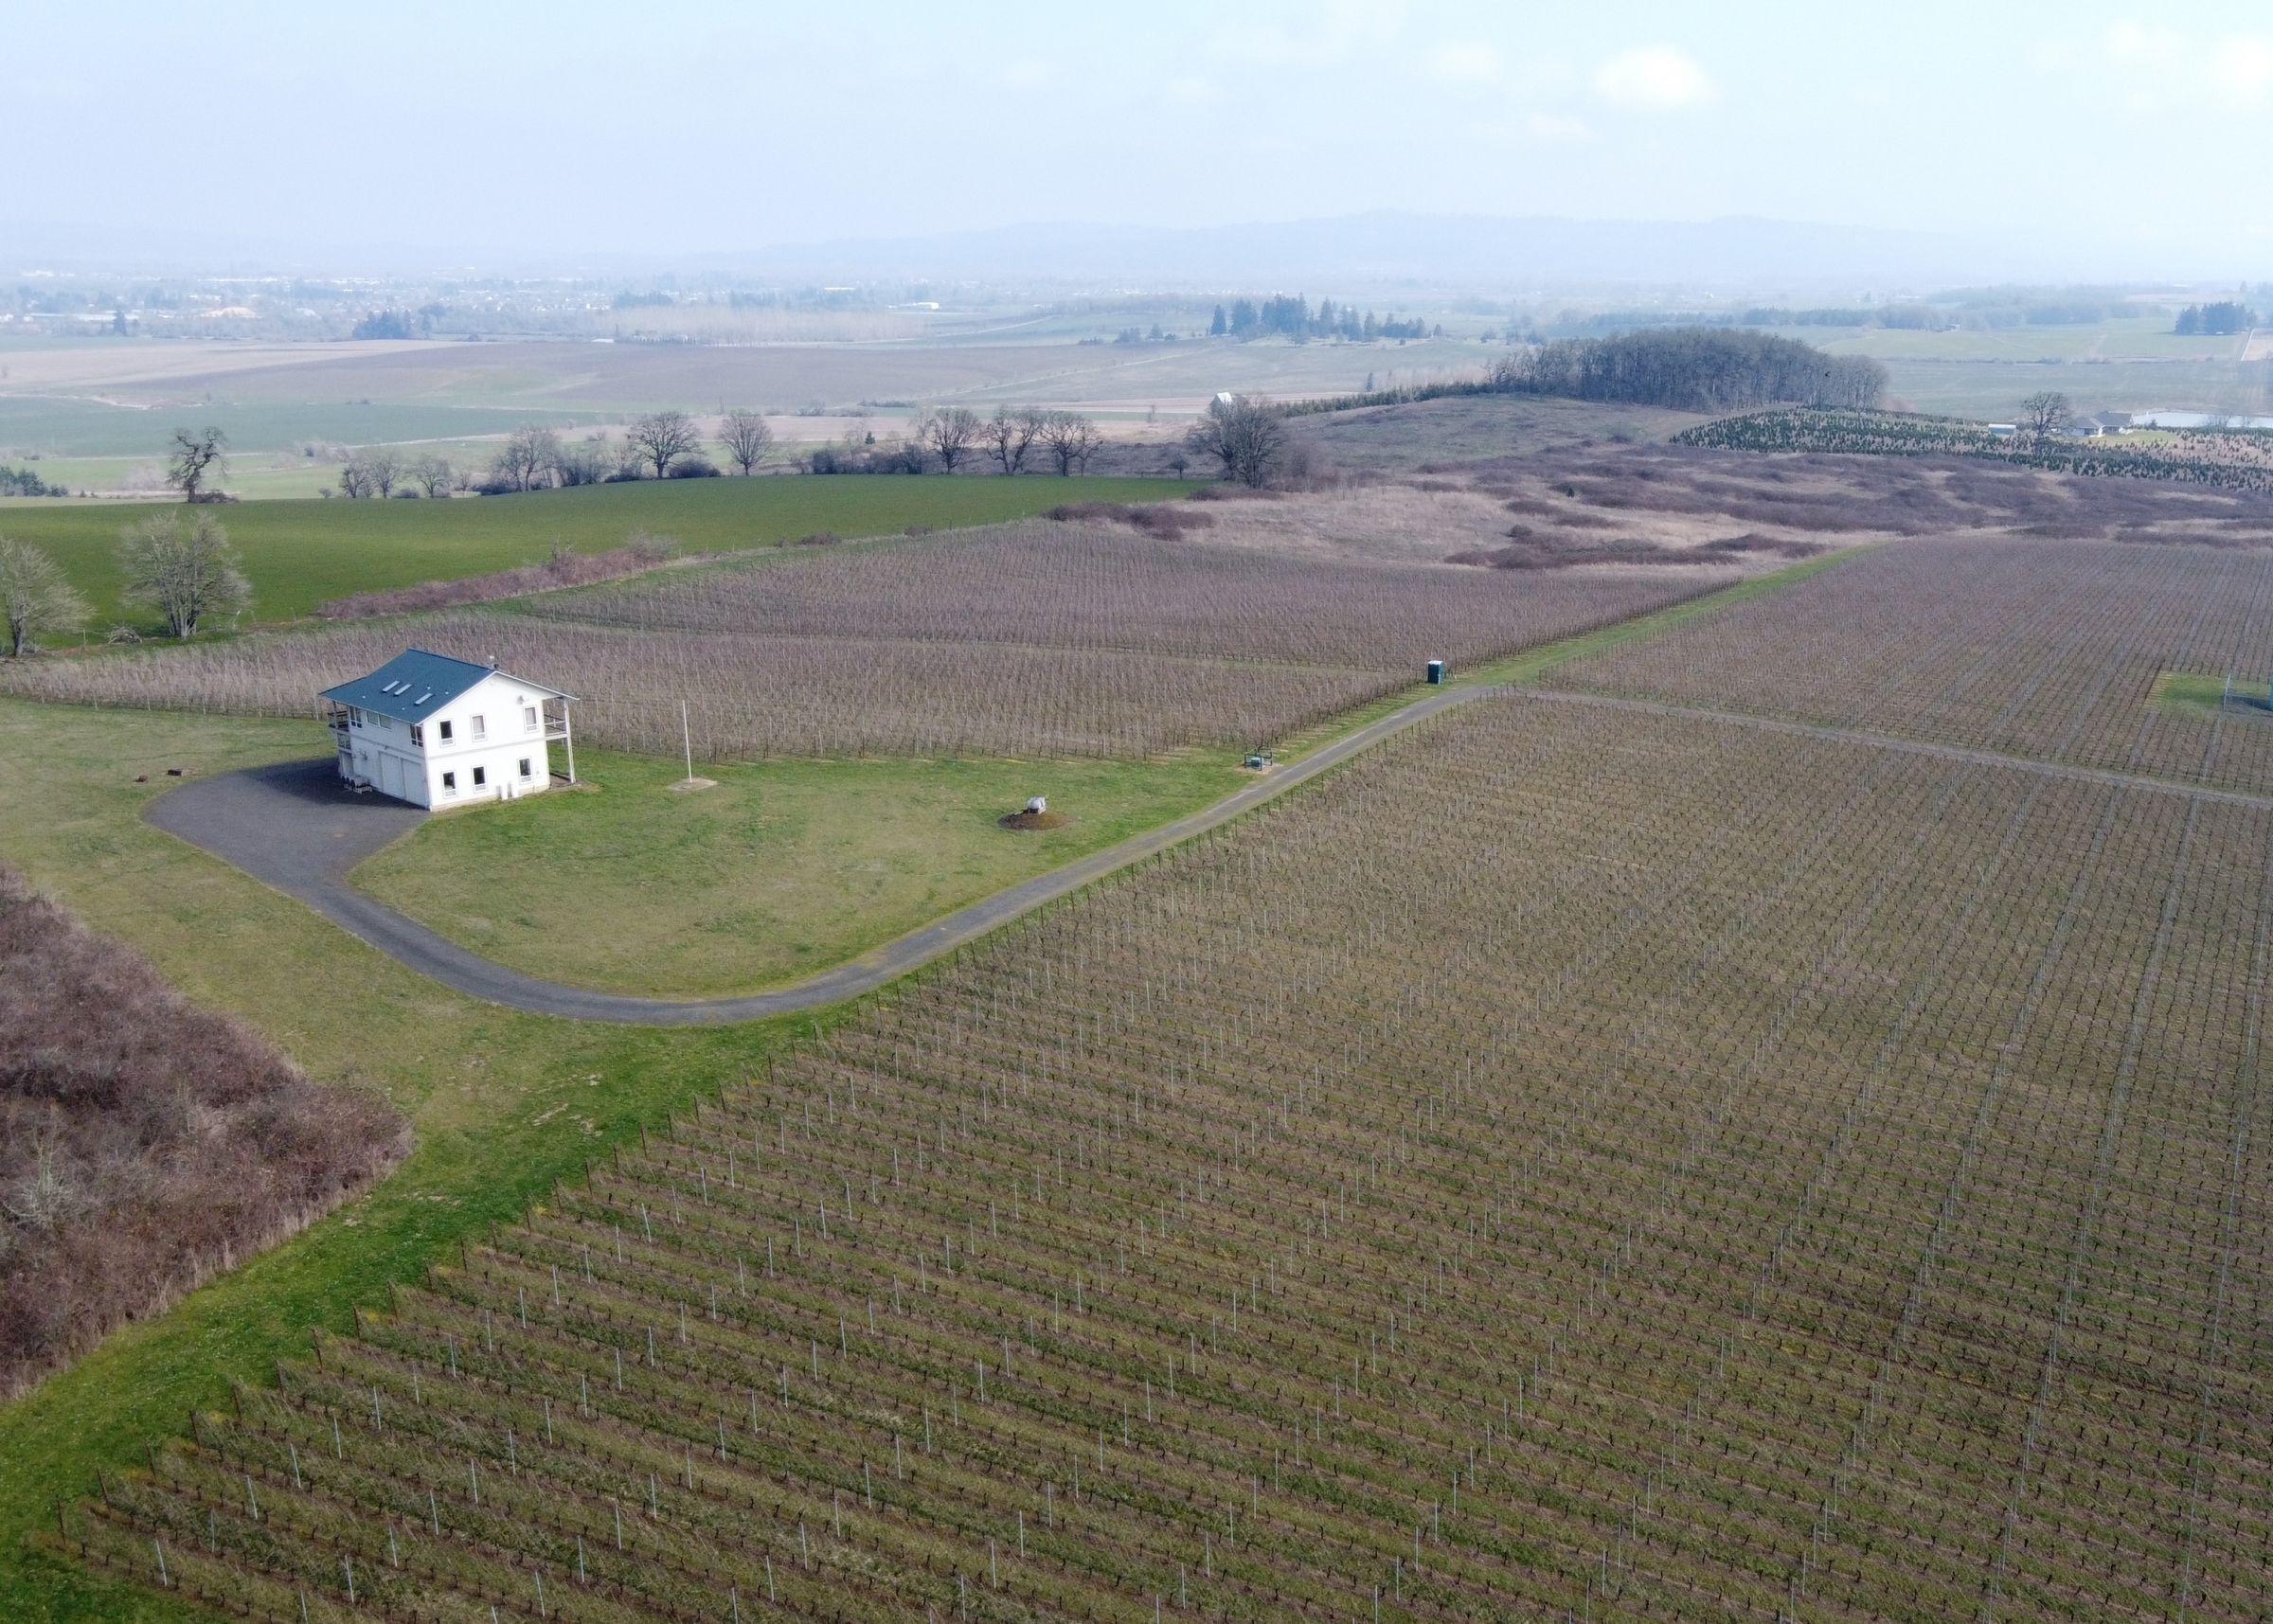 residential-land-polk-county-oregon-65-acres-listing-number-15179-3-2021-03-10-153753.JPG